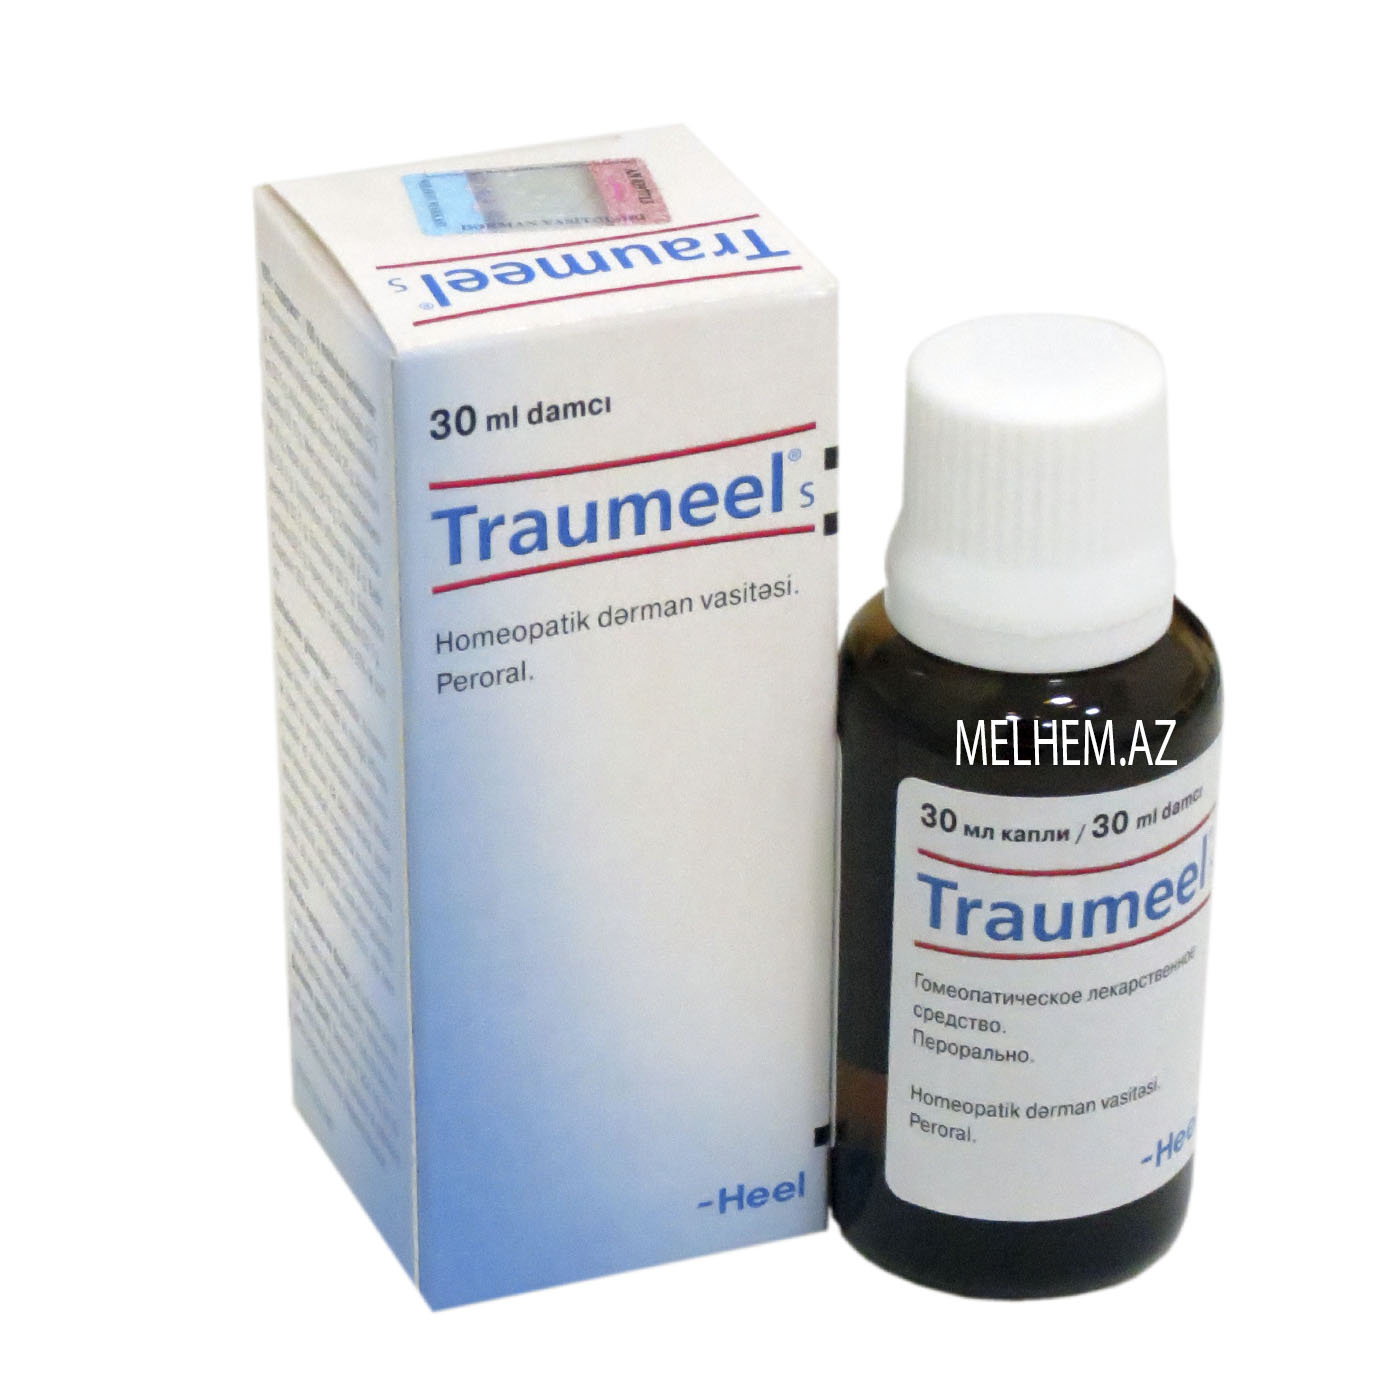 TRAUMEEL S DAMCI